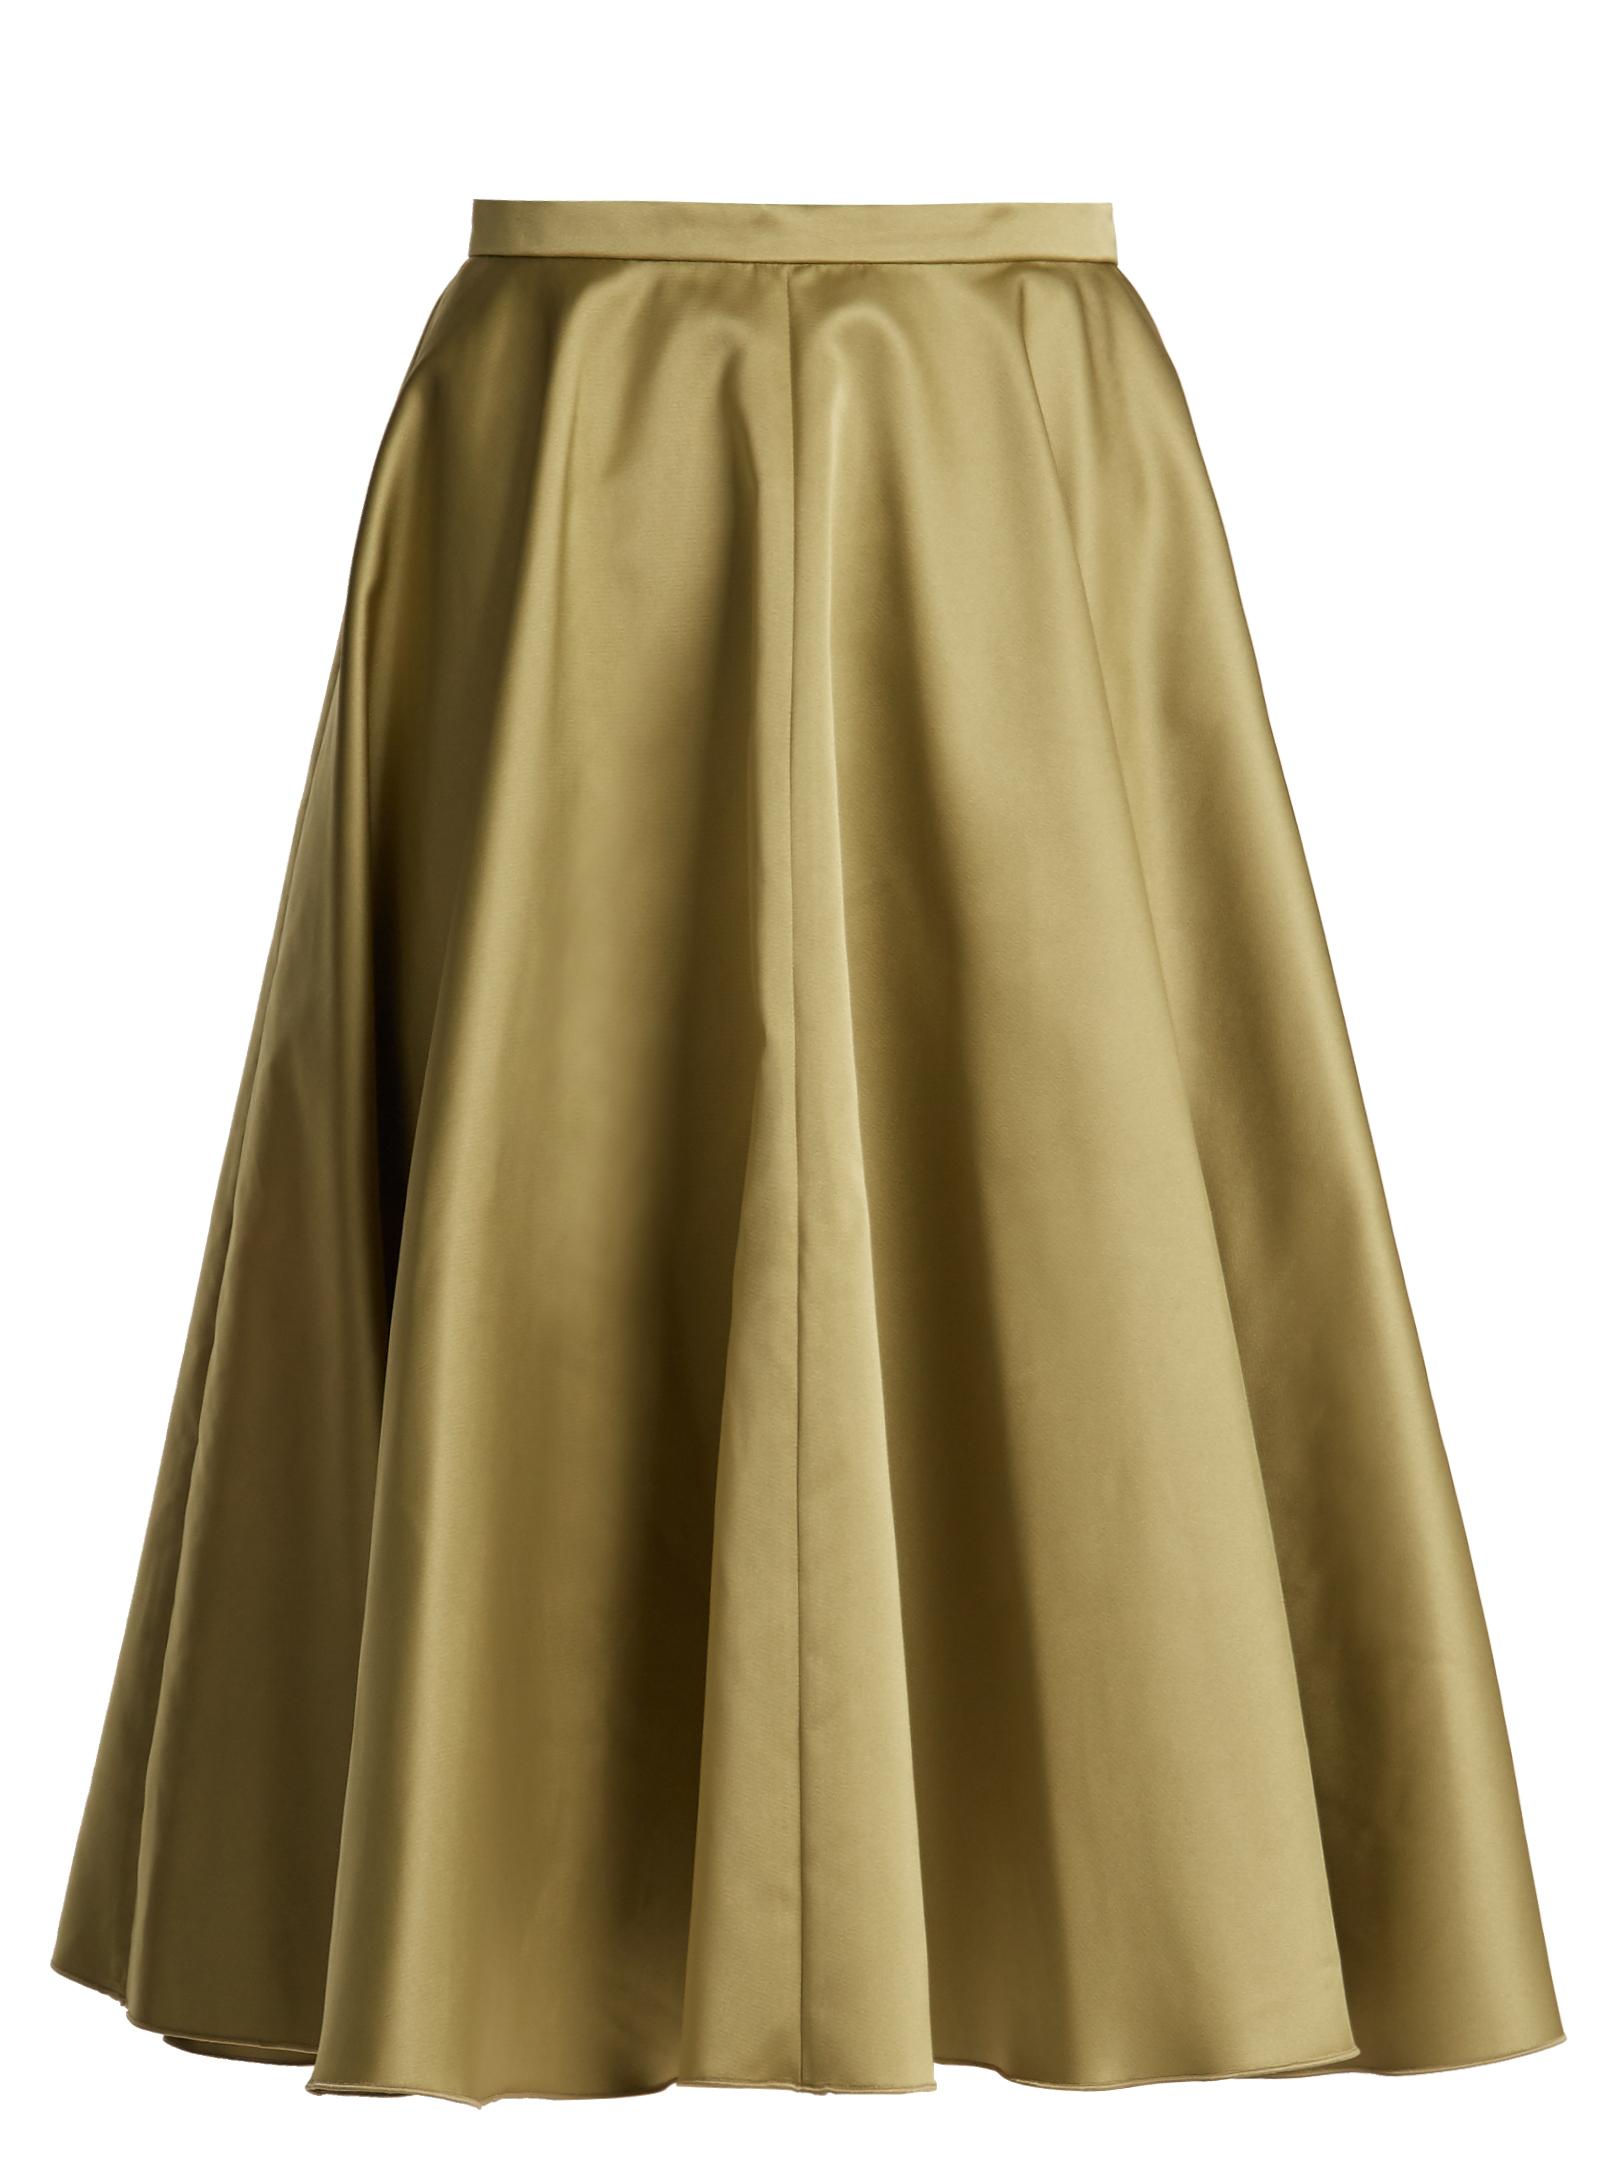 3c2d6633d3 Rochas - Pleated Duchess-Satin Midi Skirt | FASHION STYLE FAN